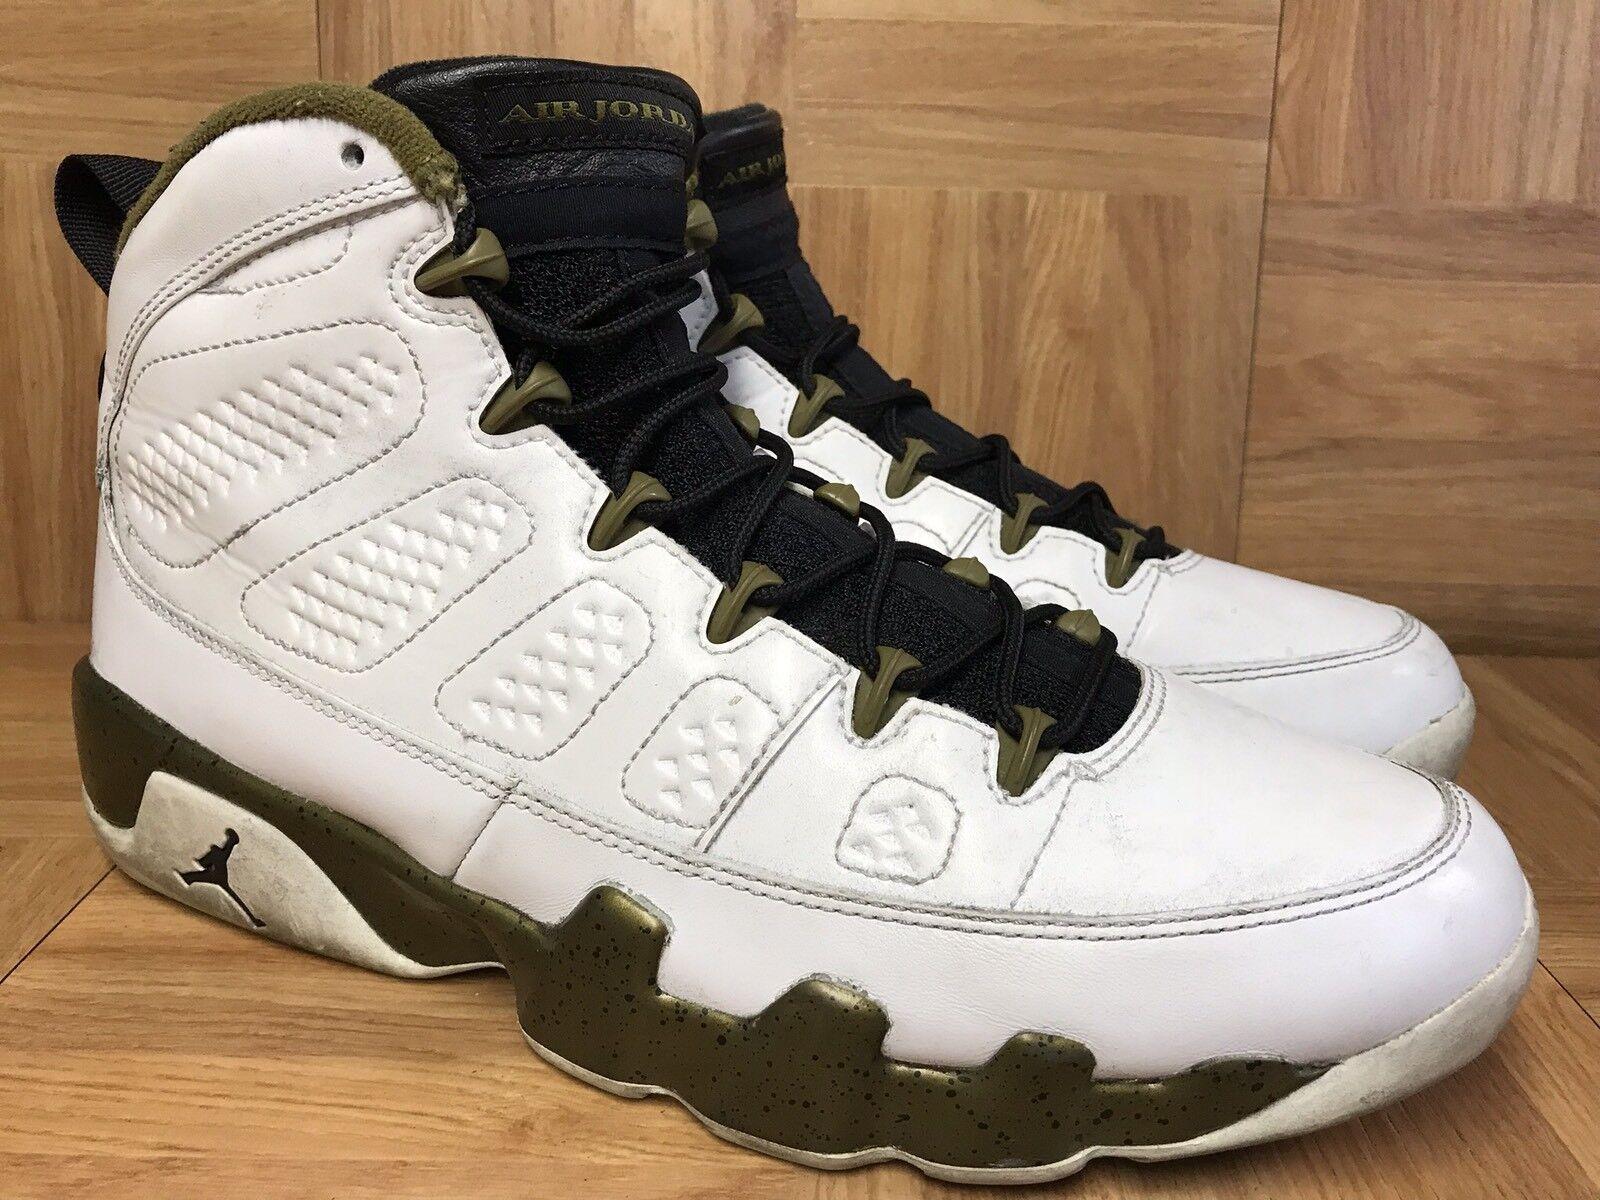 RARE Nike Air Jordan 9 IX Retro Statue White Militia Green Black 10 302370-109